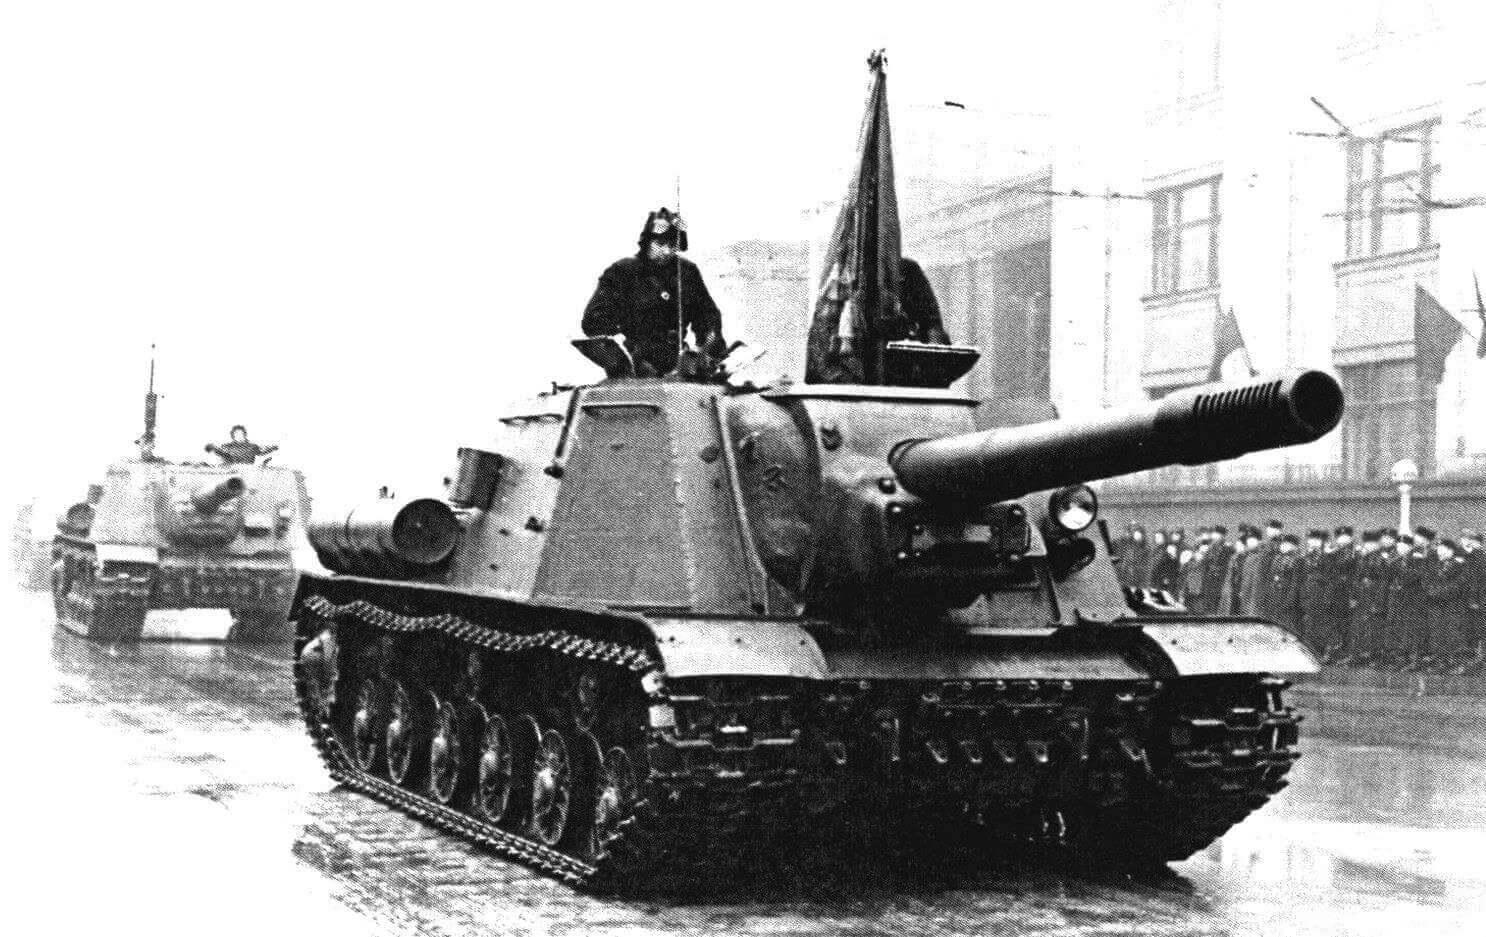 Самоходная установка ИСУ-152 по пути на Красную площадь. Москва, 7 ноября 1950 года